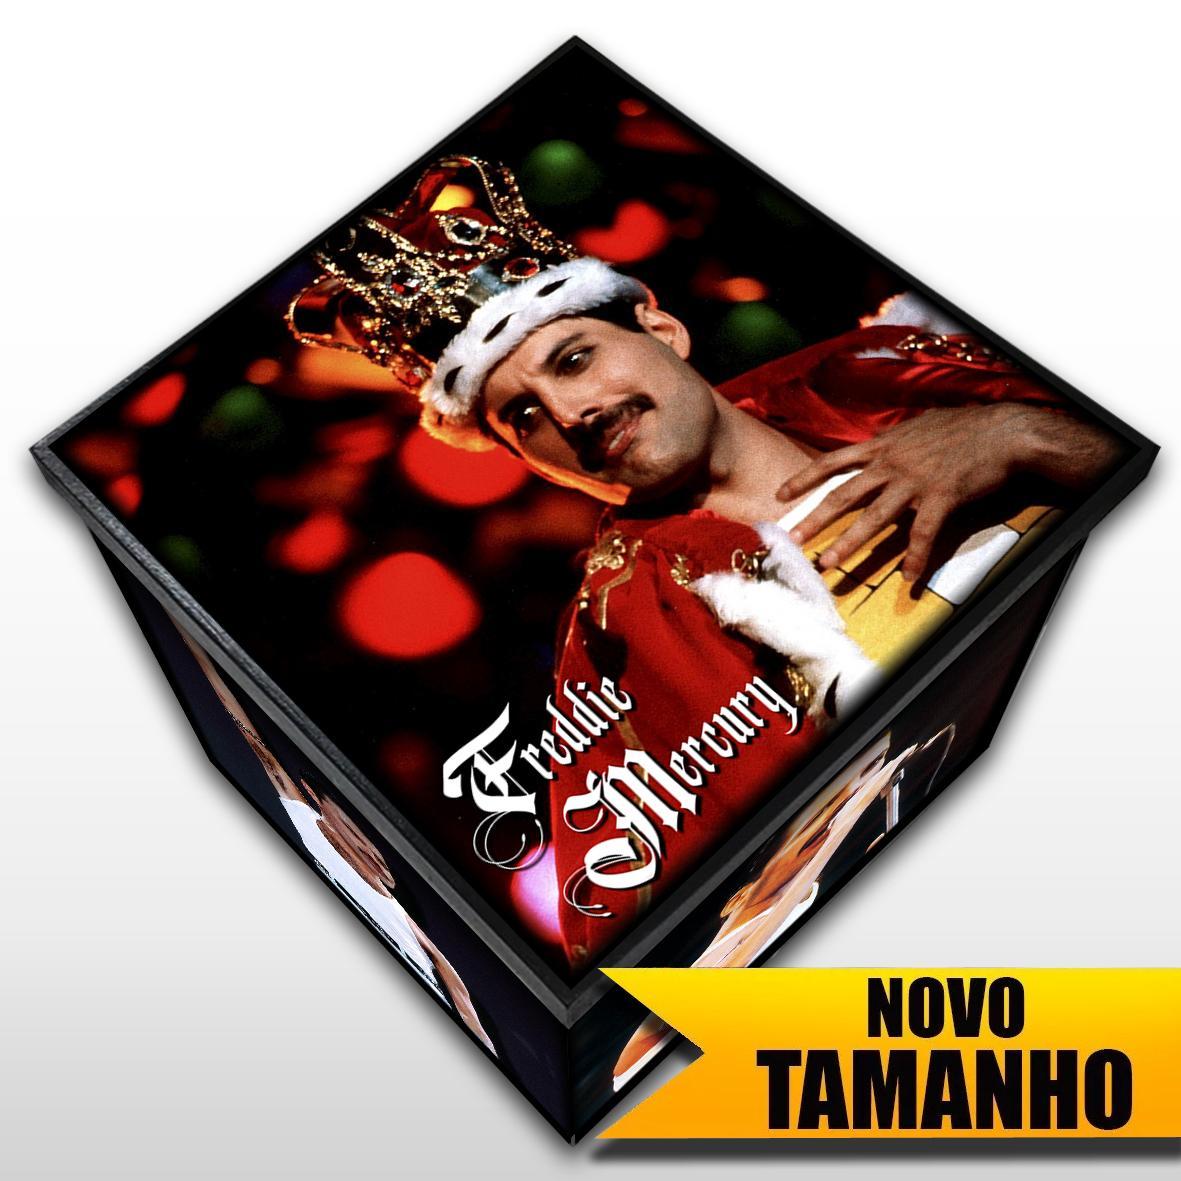 Freddie Mercury - Queen - Caixa em MDF - Tam. Grande - Mr. Rock